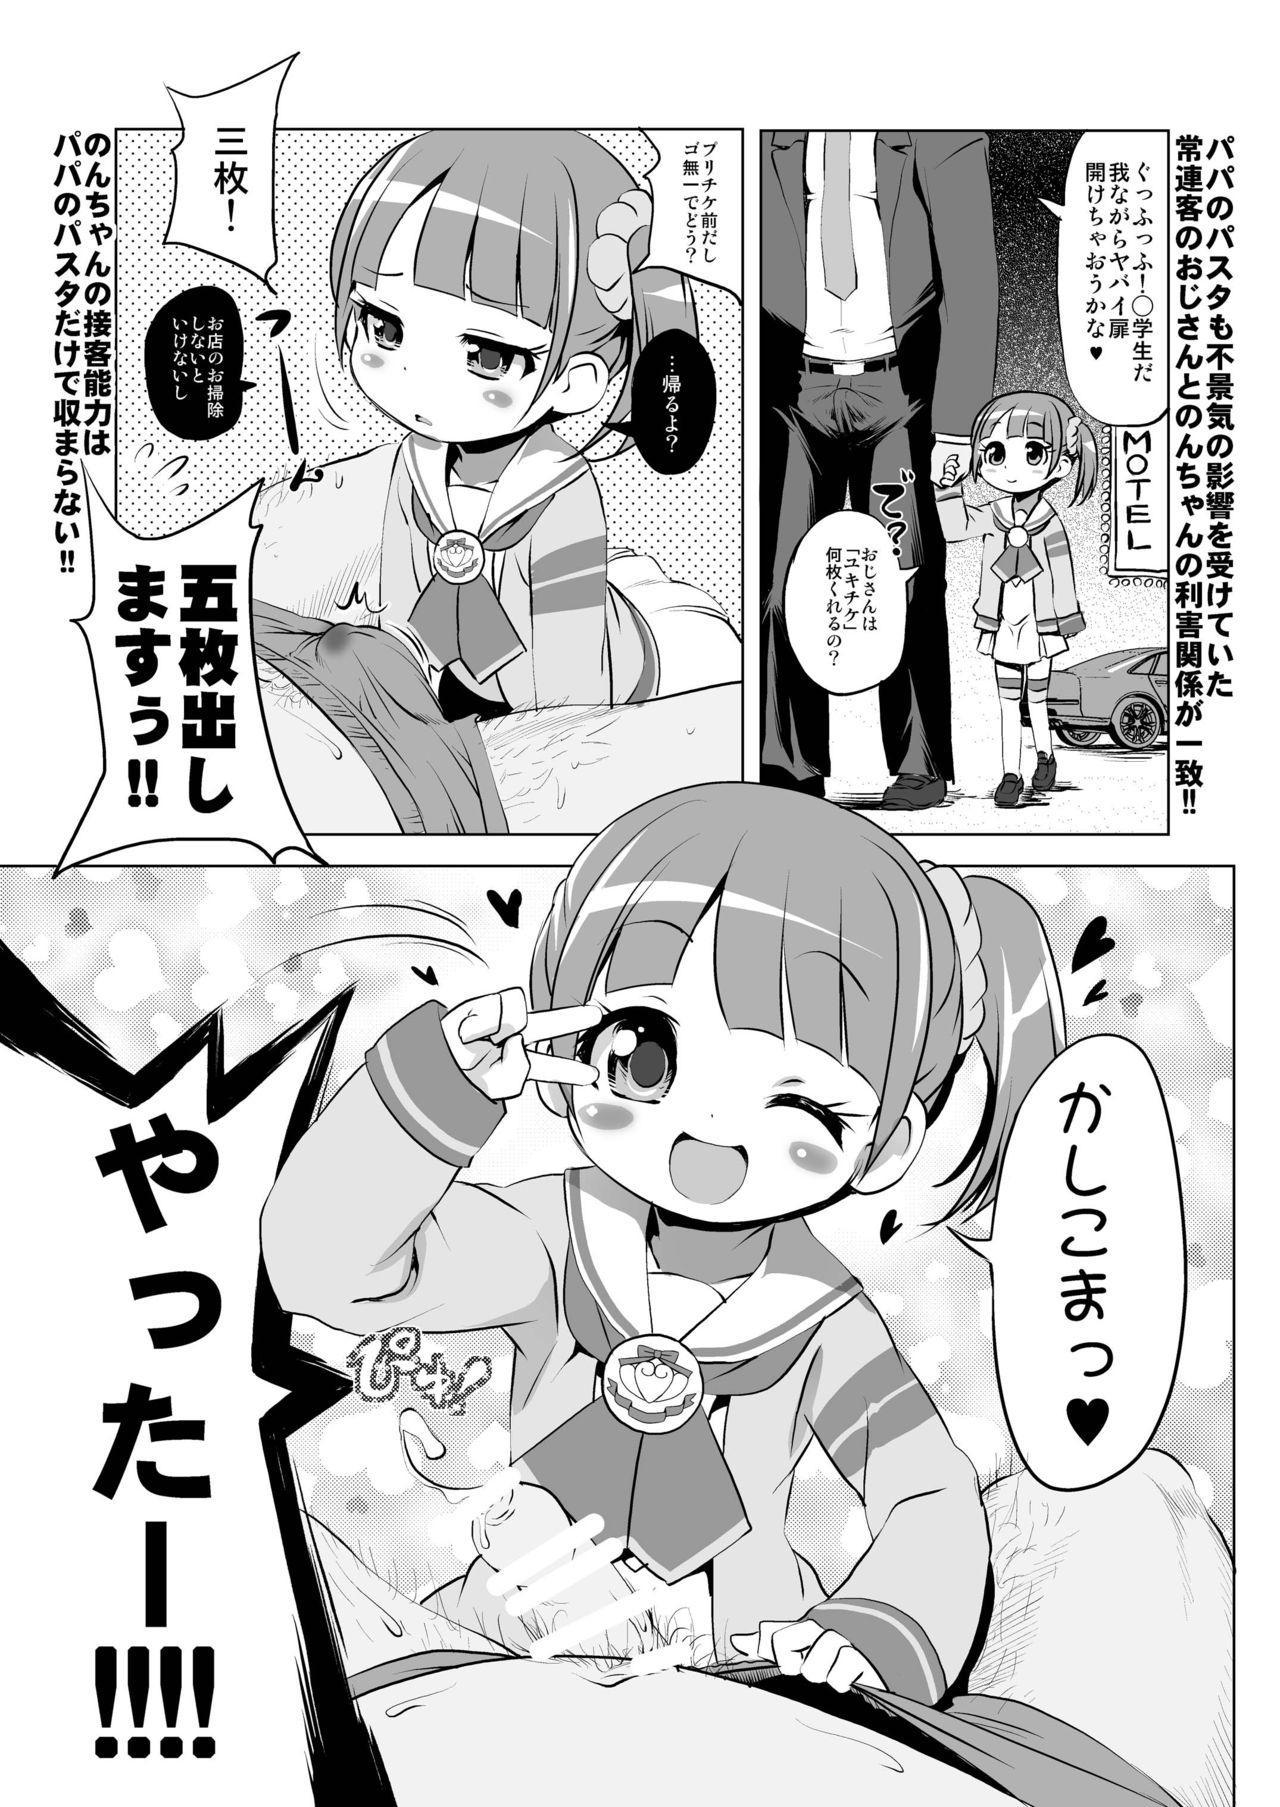 Yukichikepako tte Kashikoma! 2